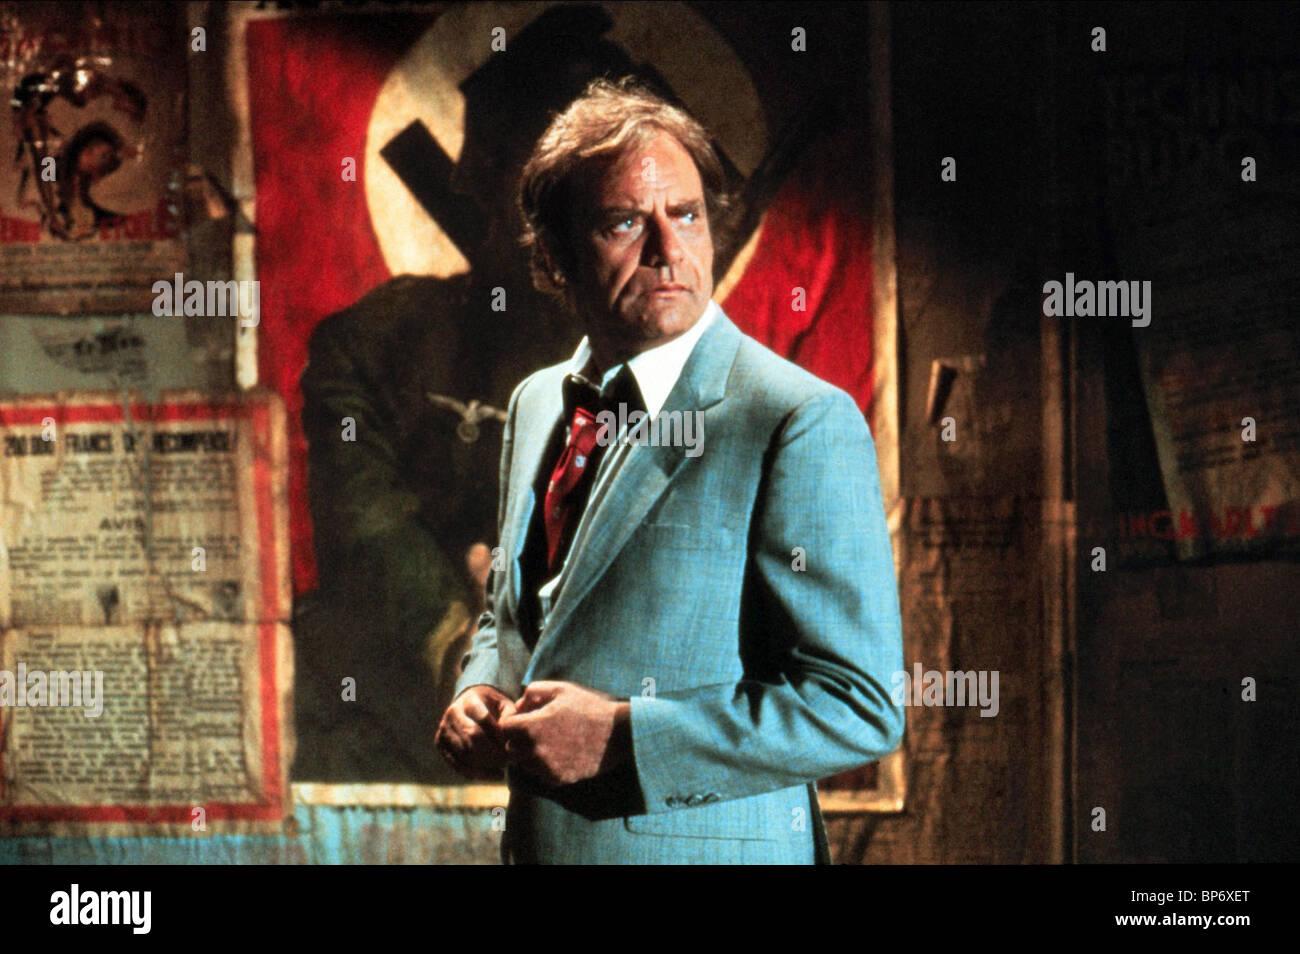 VIC MORROW TWILIGHT ZONE: THE MOVIE (1983) - Stock Image